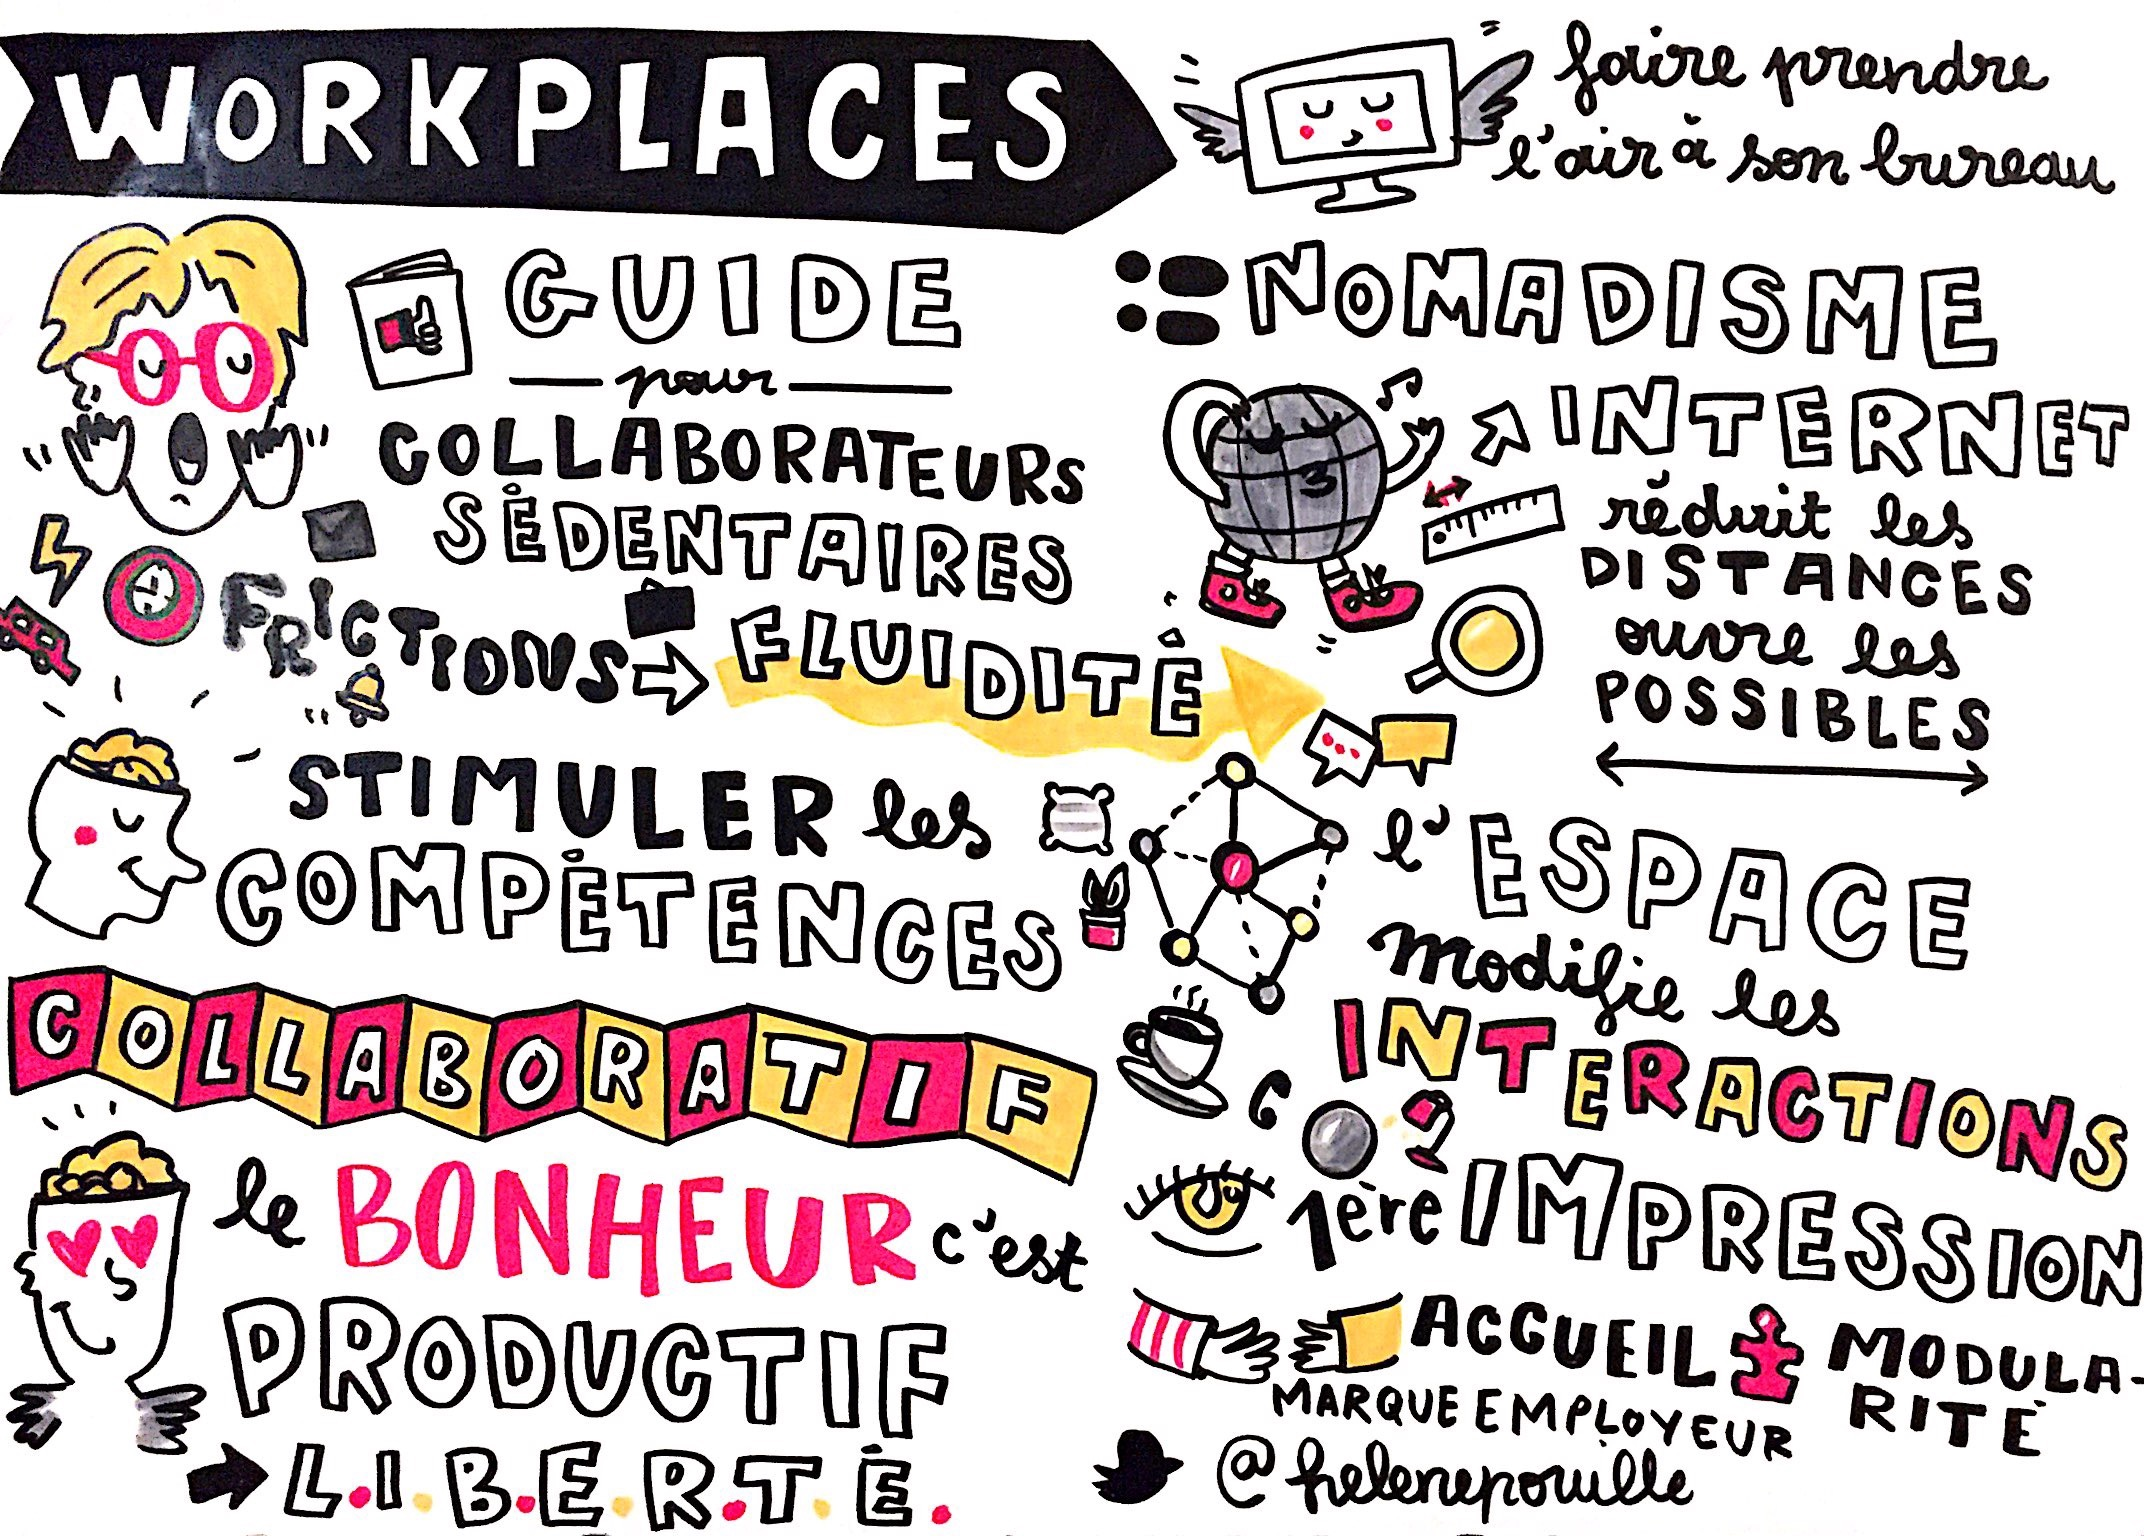 fow_workplaces.jpg